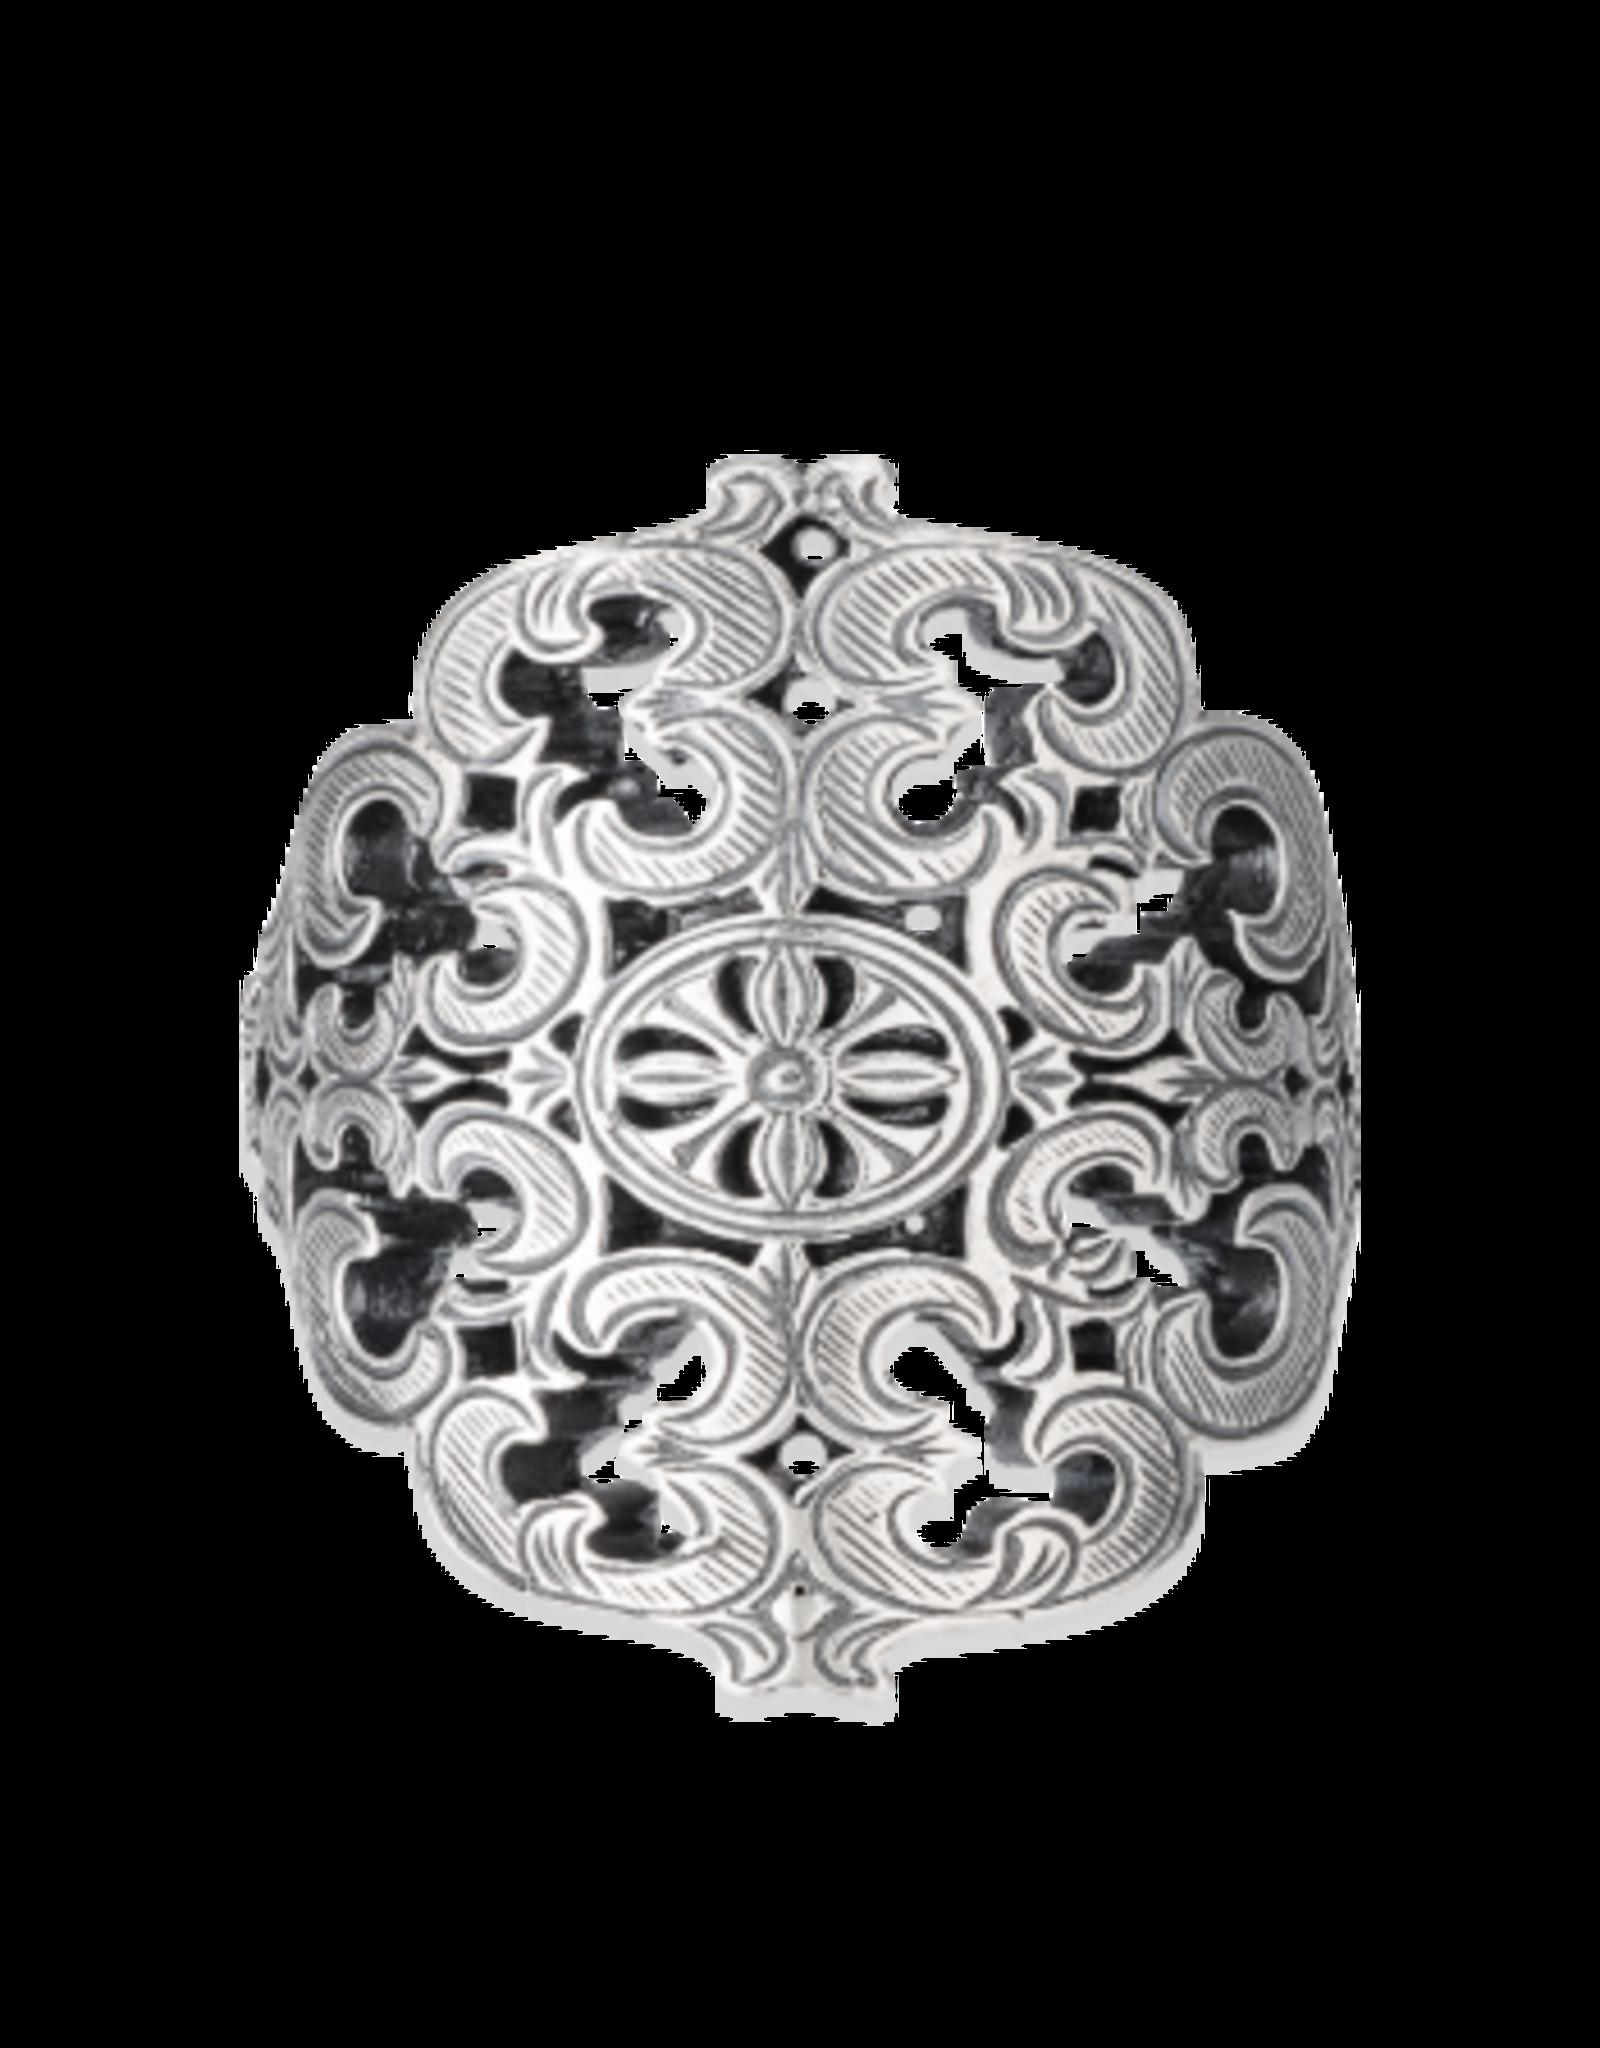 Mignon Faget Renaissance Ring Sterling